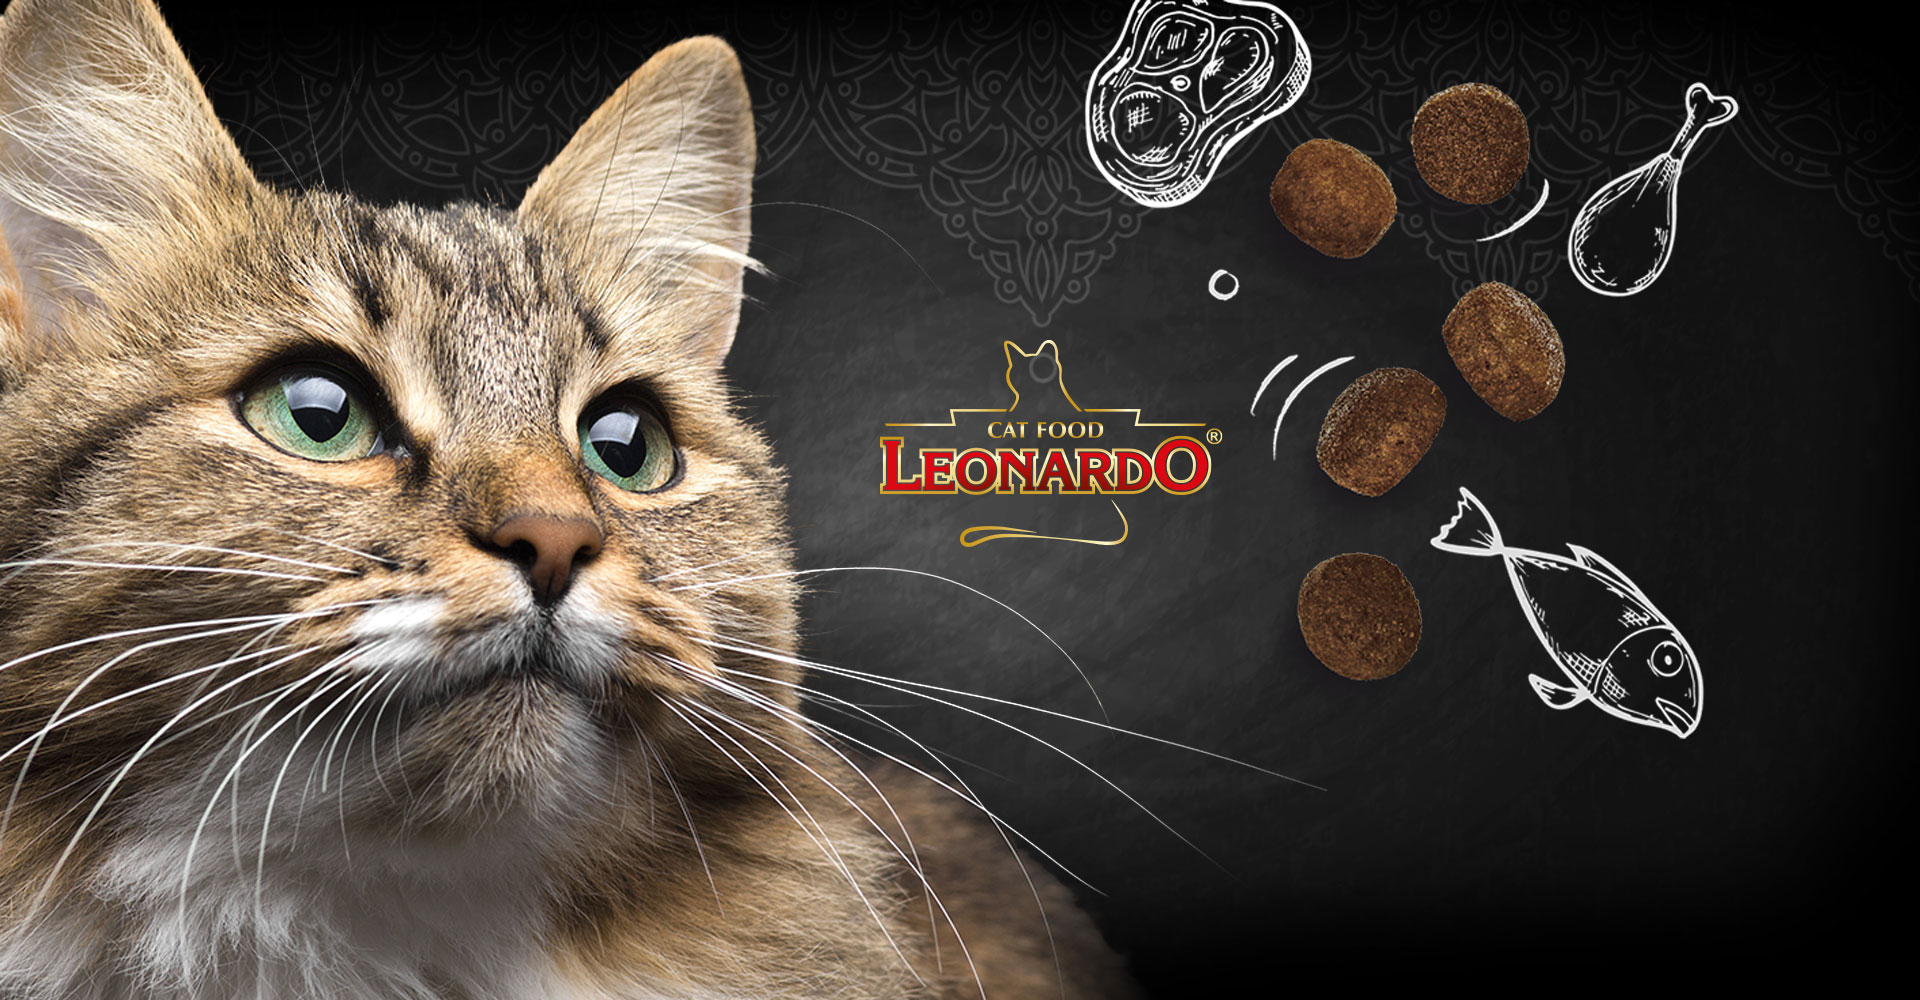 LEONARDO catfood Katzenfutter